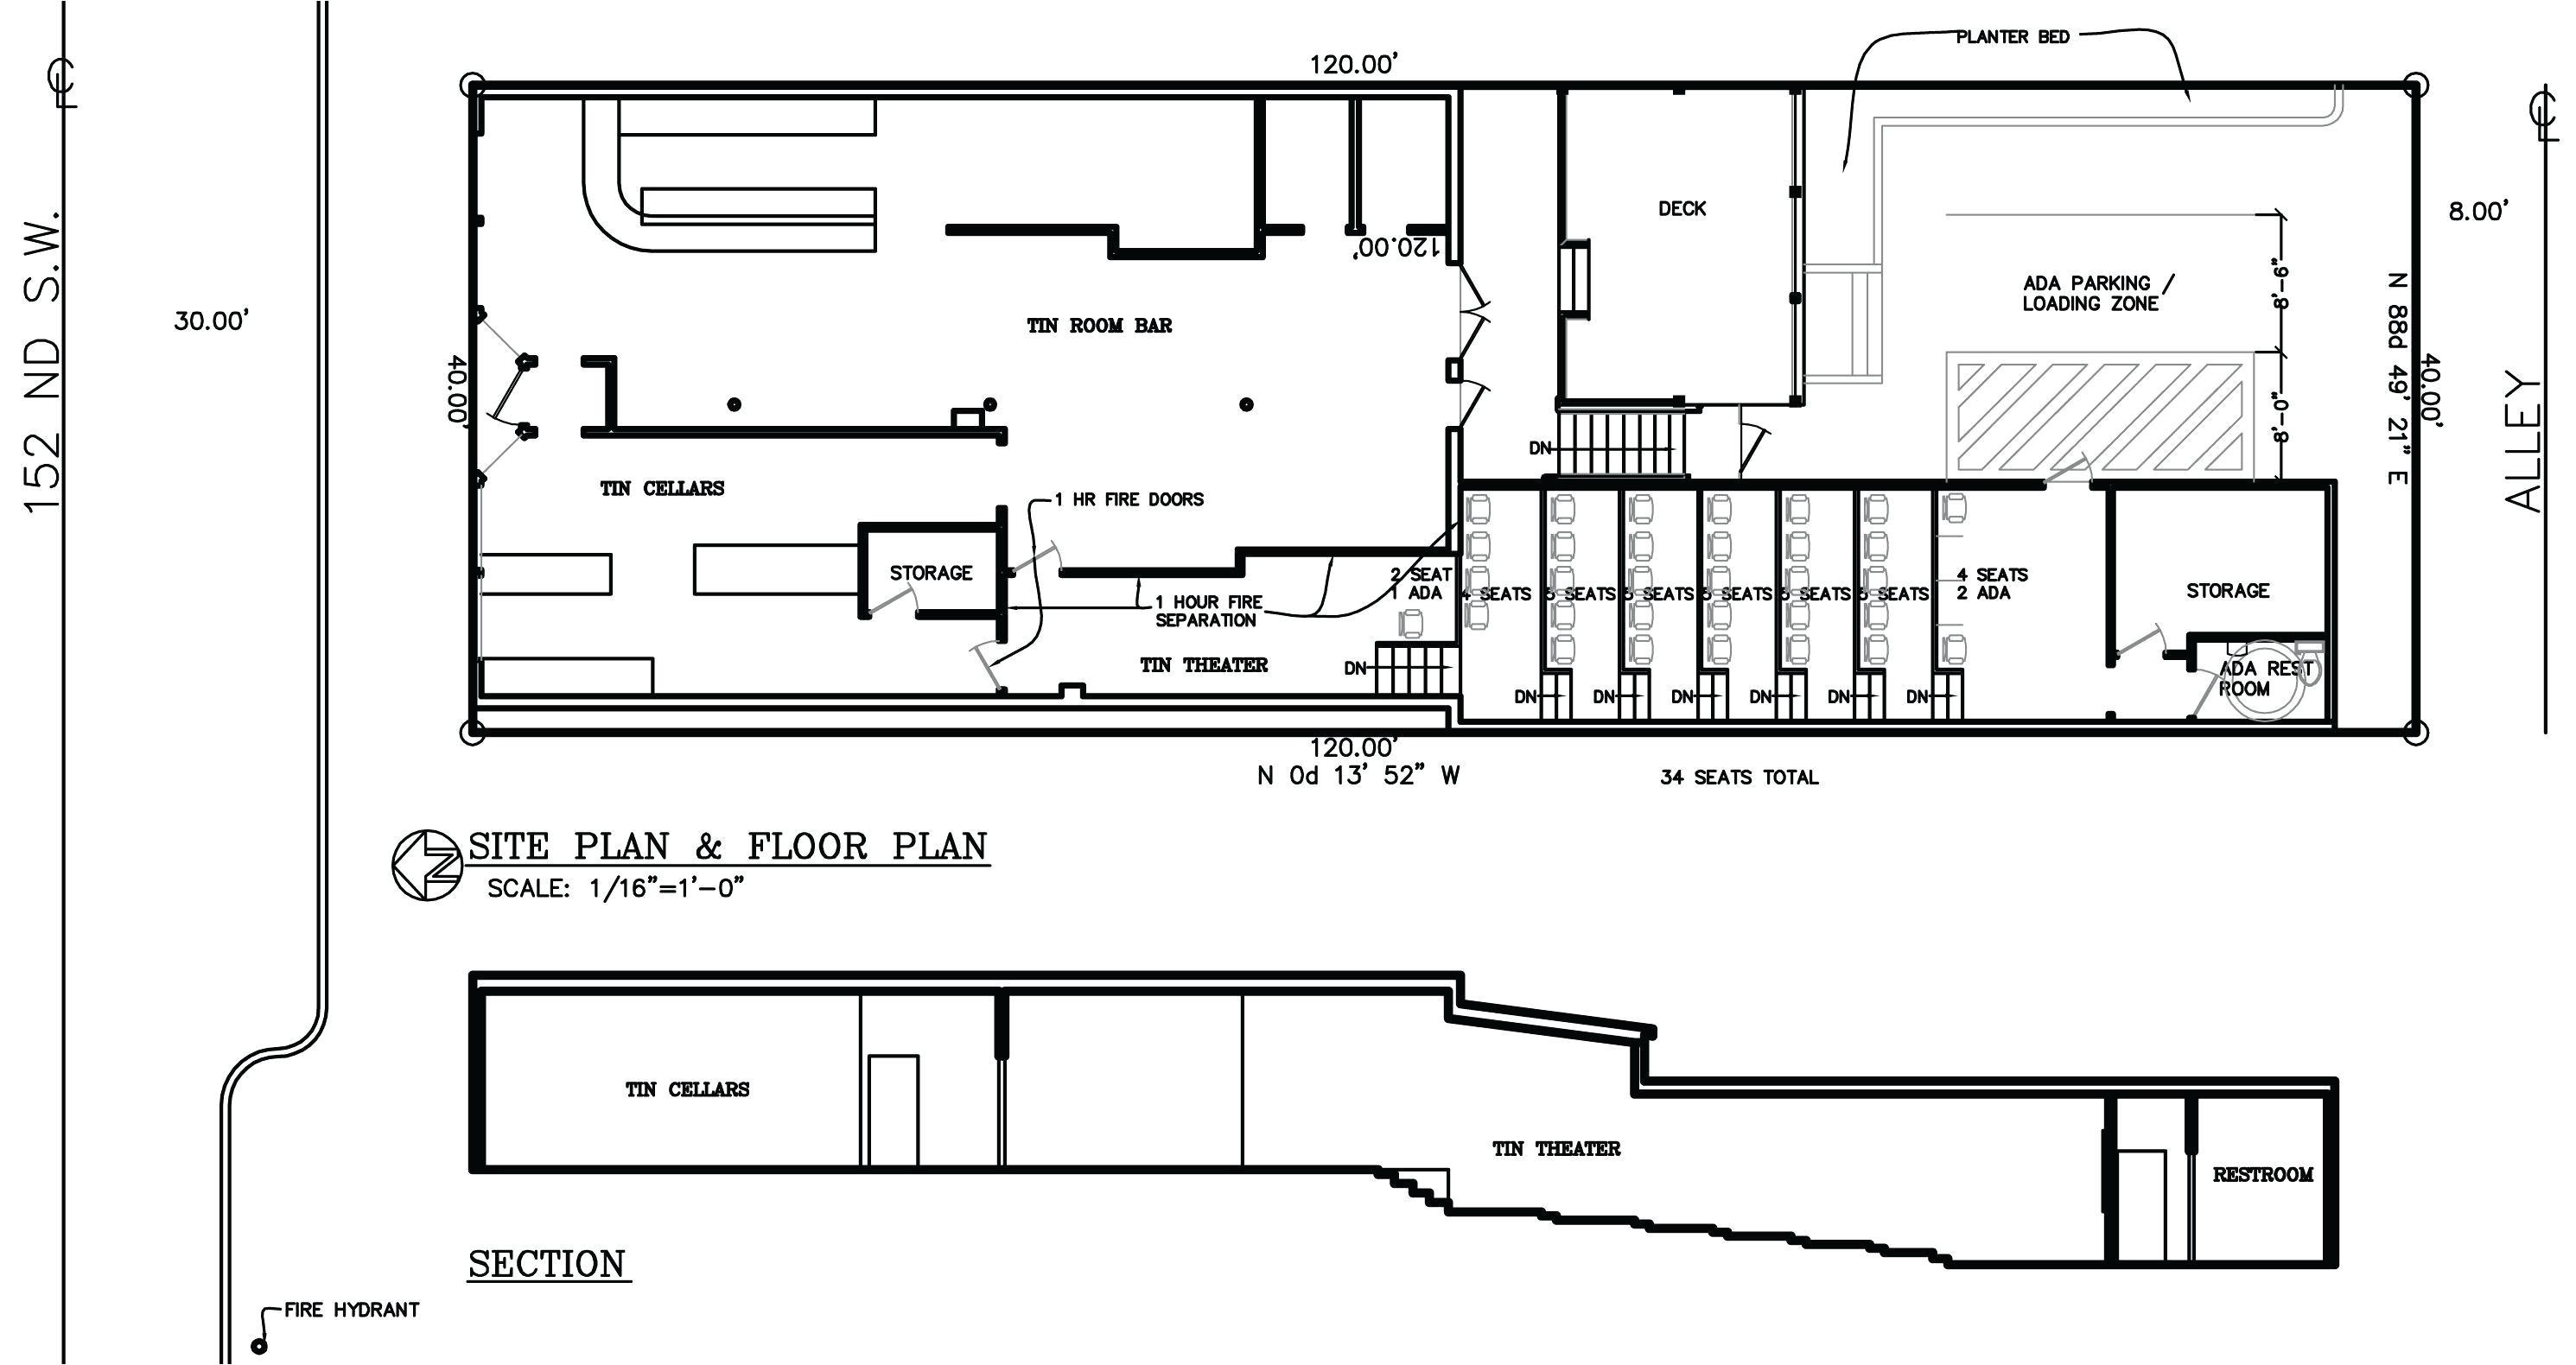 house of blues floor plan houston